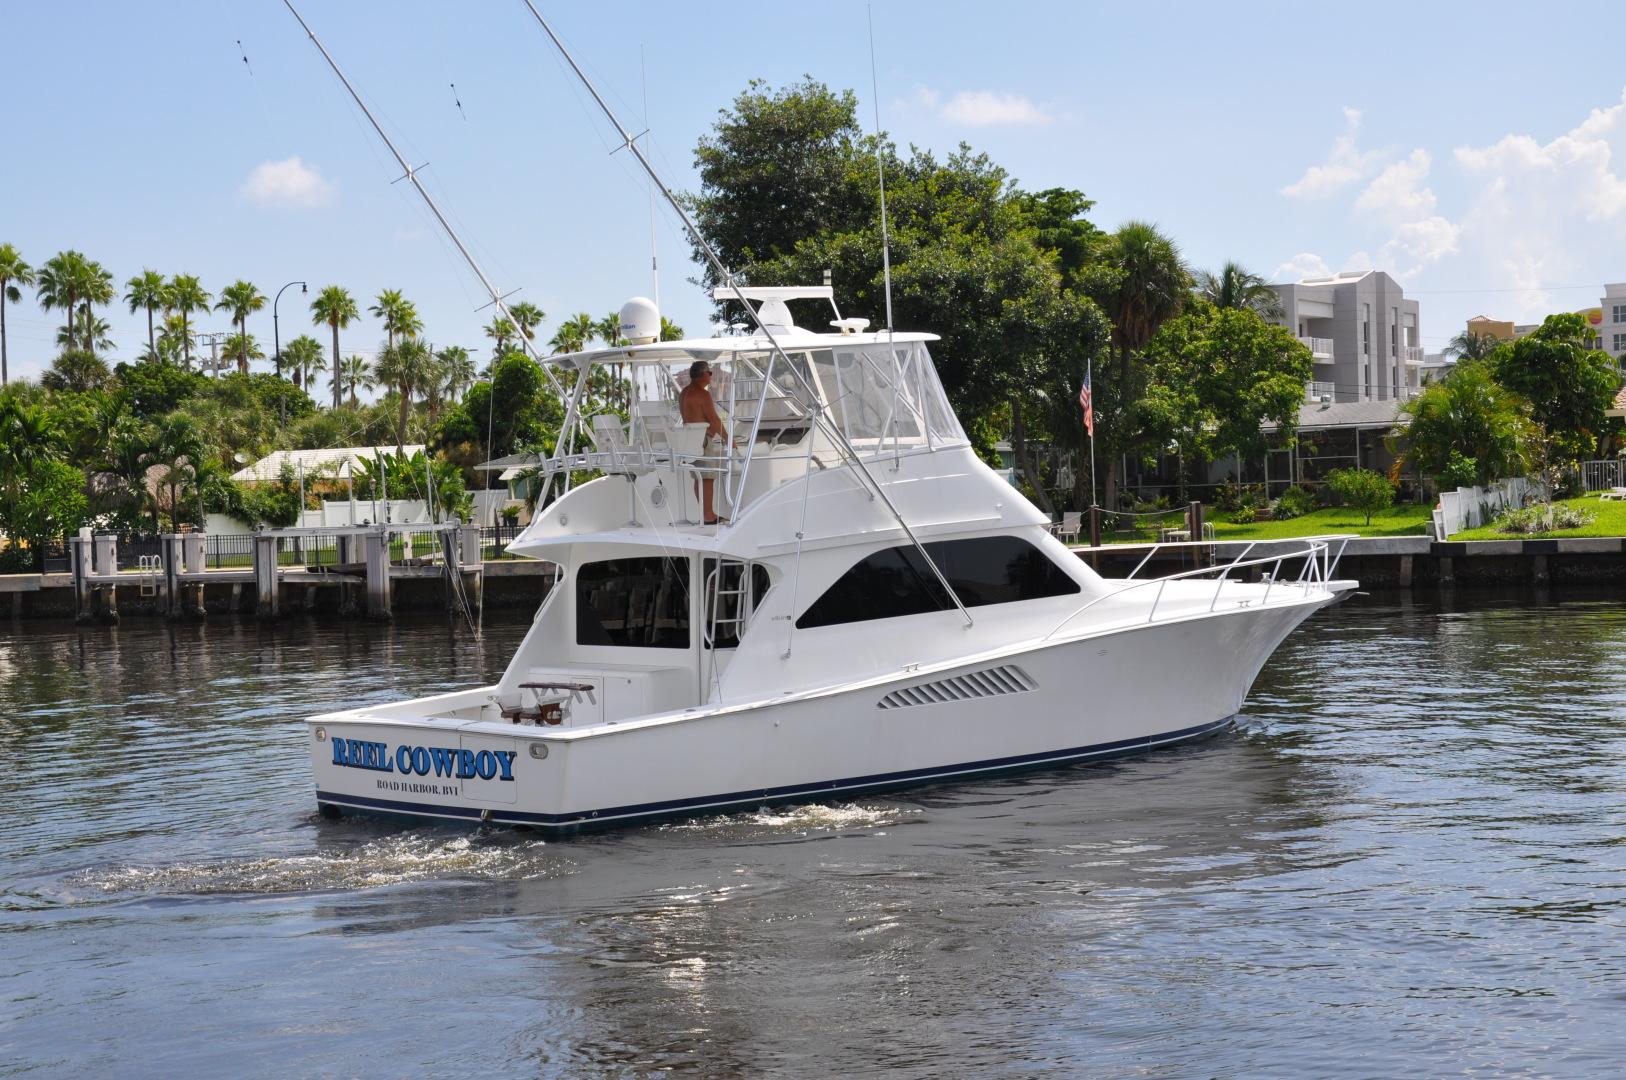 Viking-Convertible 2003-Reel Cowboy Deerfield Beach-Florida-United States-Stern Profile-1546864 | Thumbnail